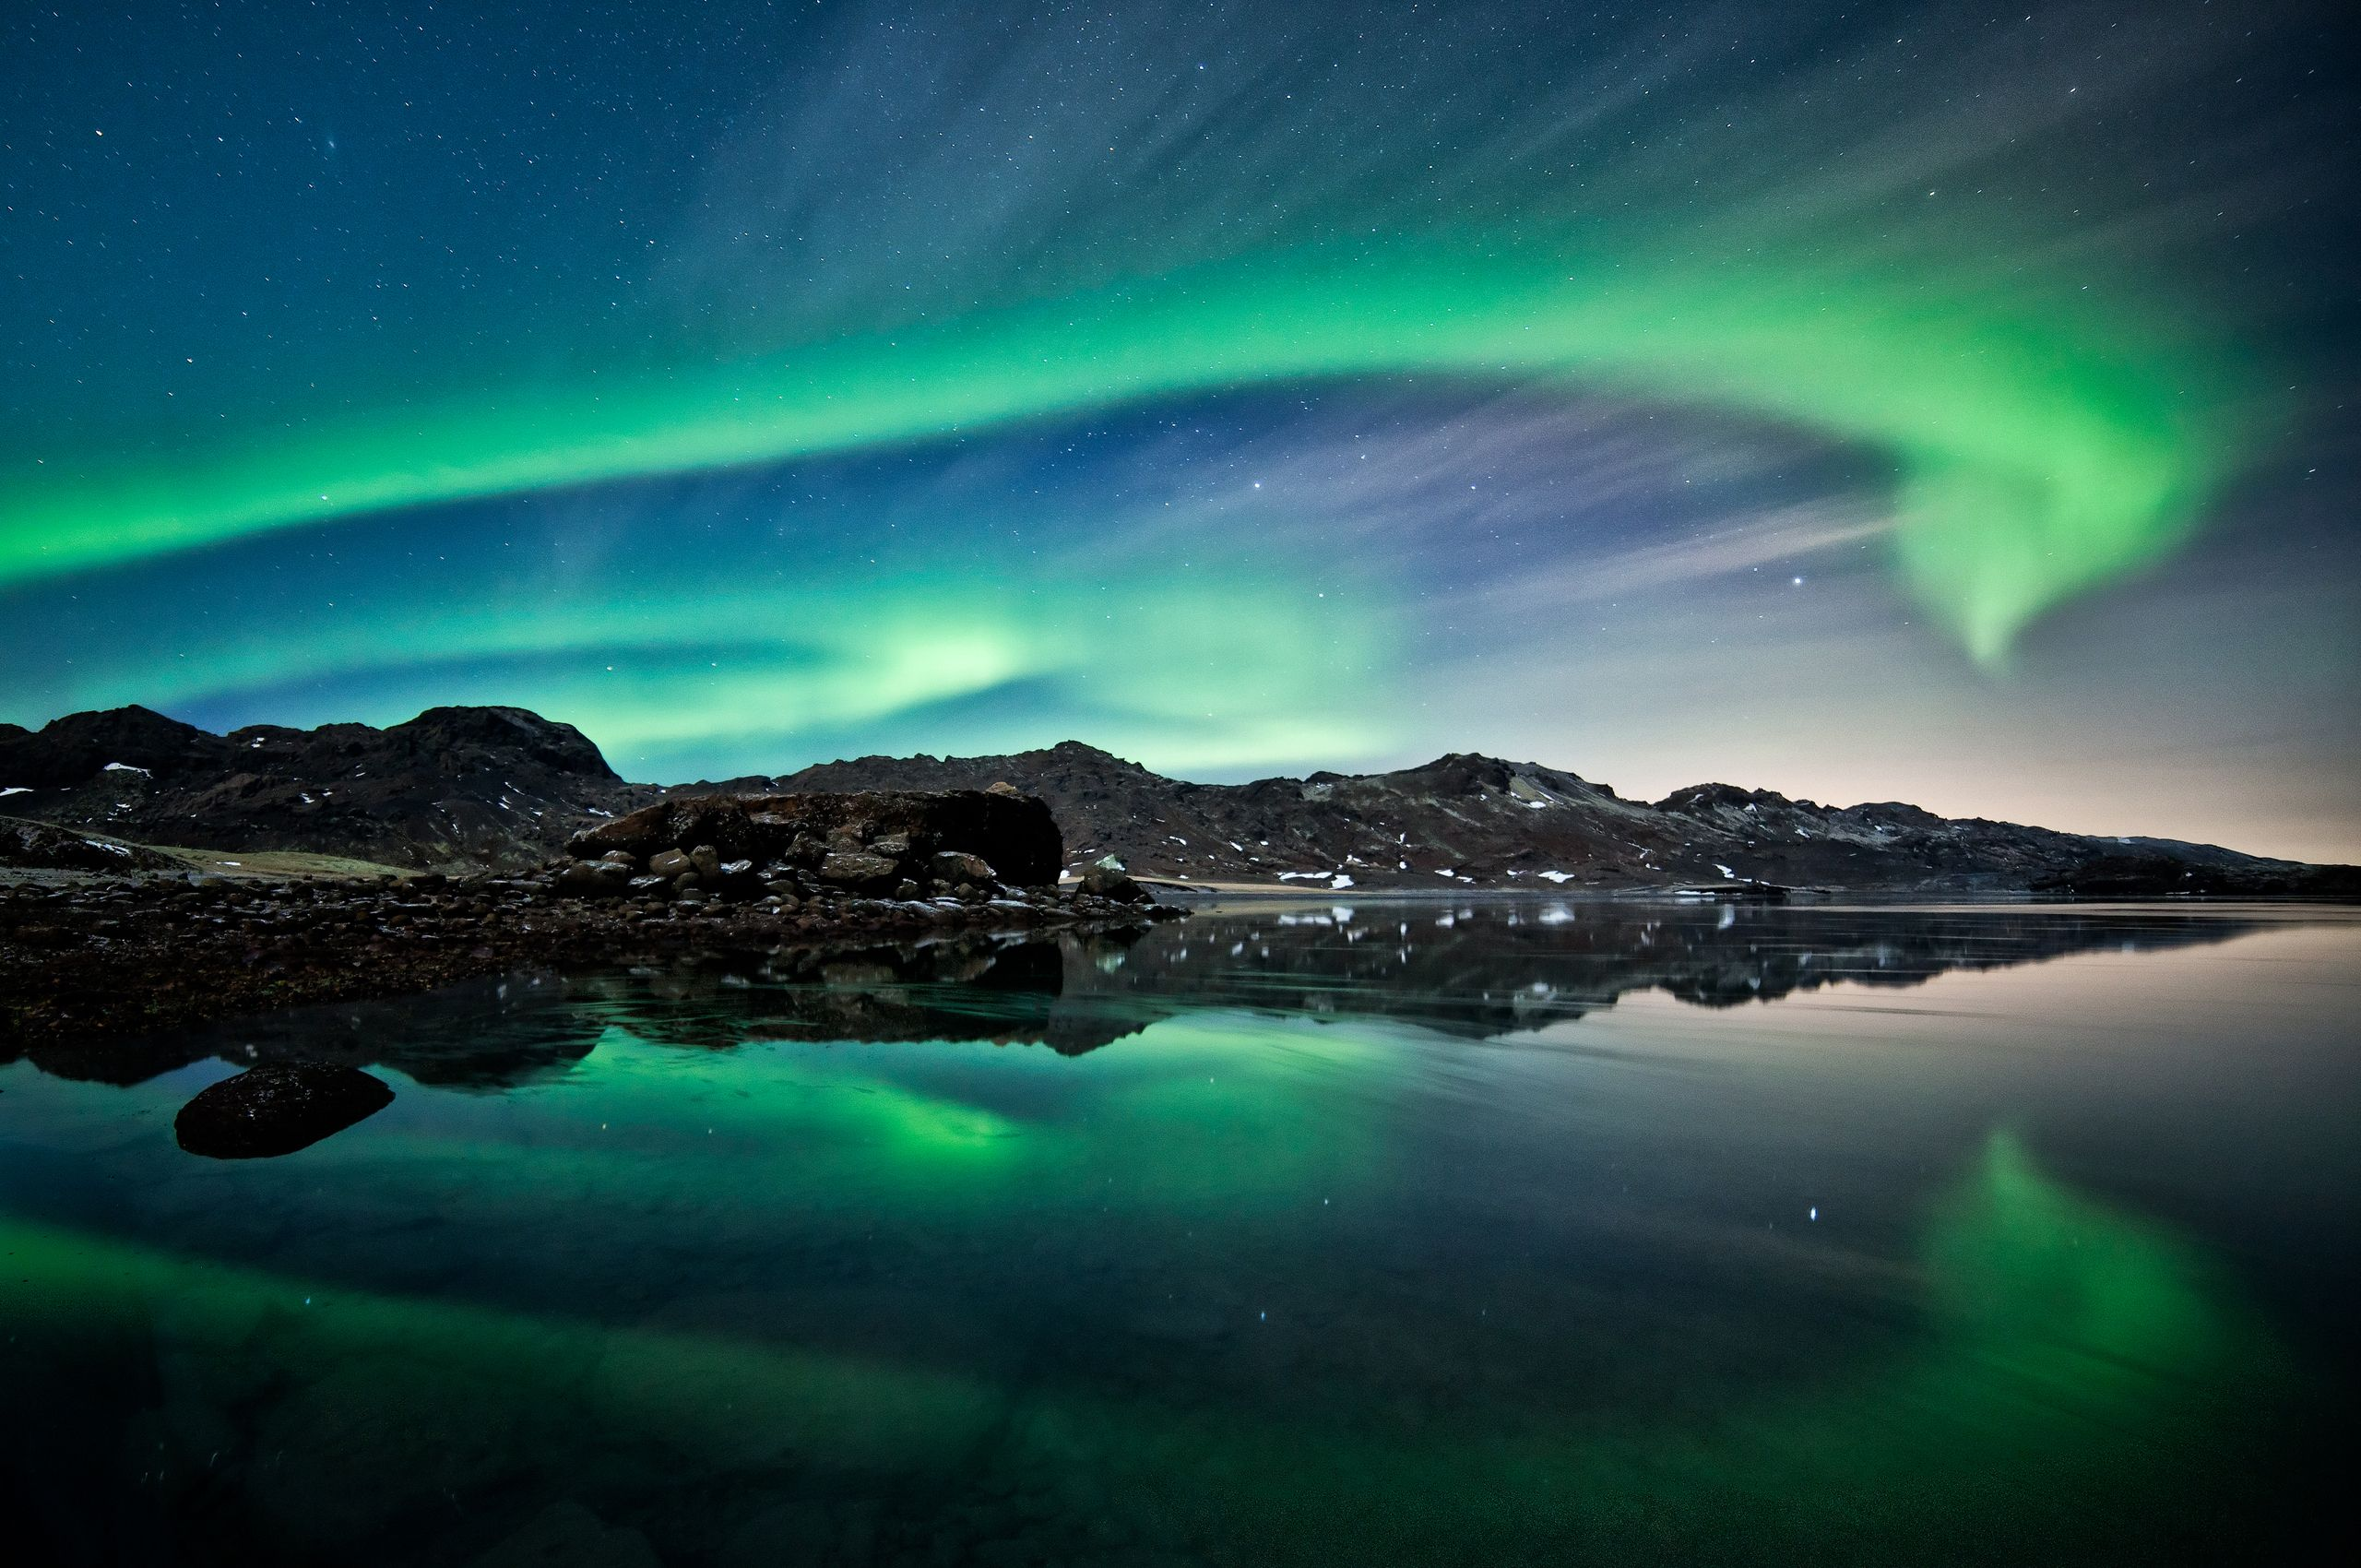 Beautiful Aurora Borealis Hd Wallpapers Jpg 2560 1700 Northern Lights Wallpaper Northern Lights Tours Northern Lights